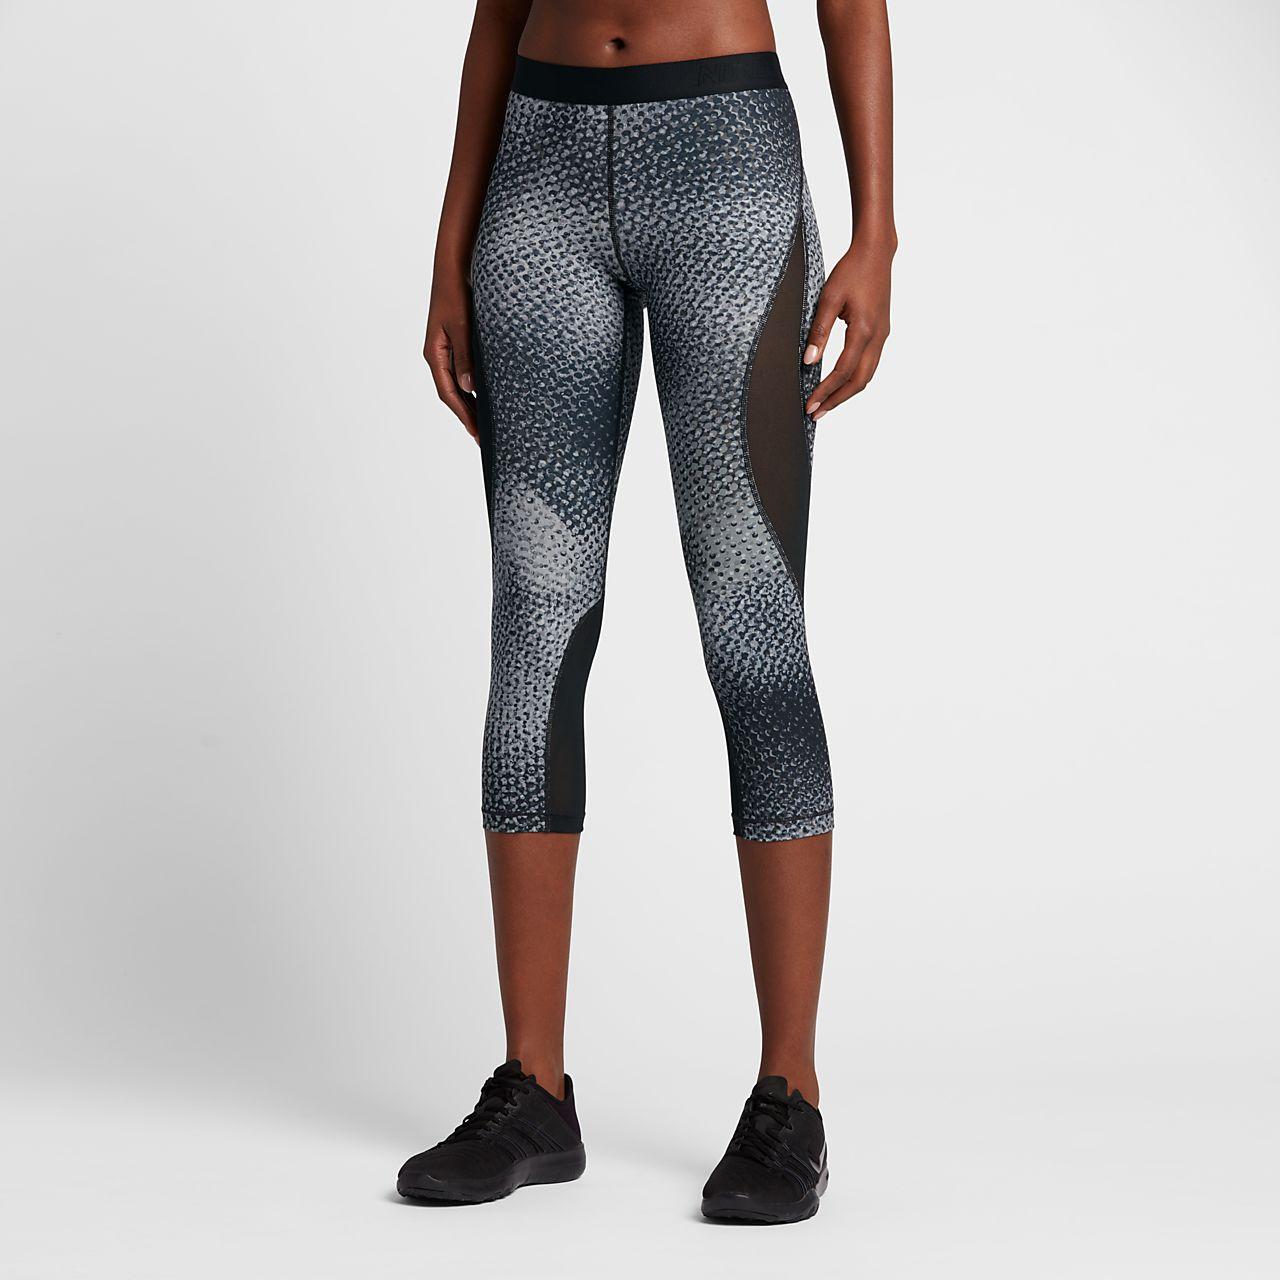 Nike Pro. Women's Printed Training Tights. $75 $54.97. Prev